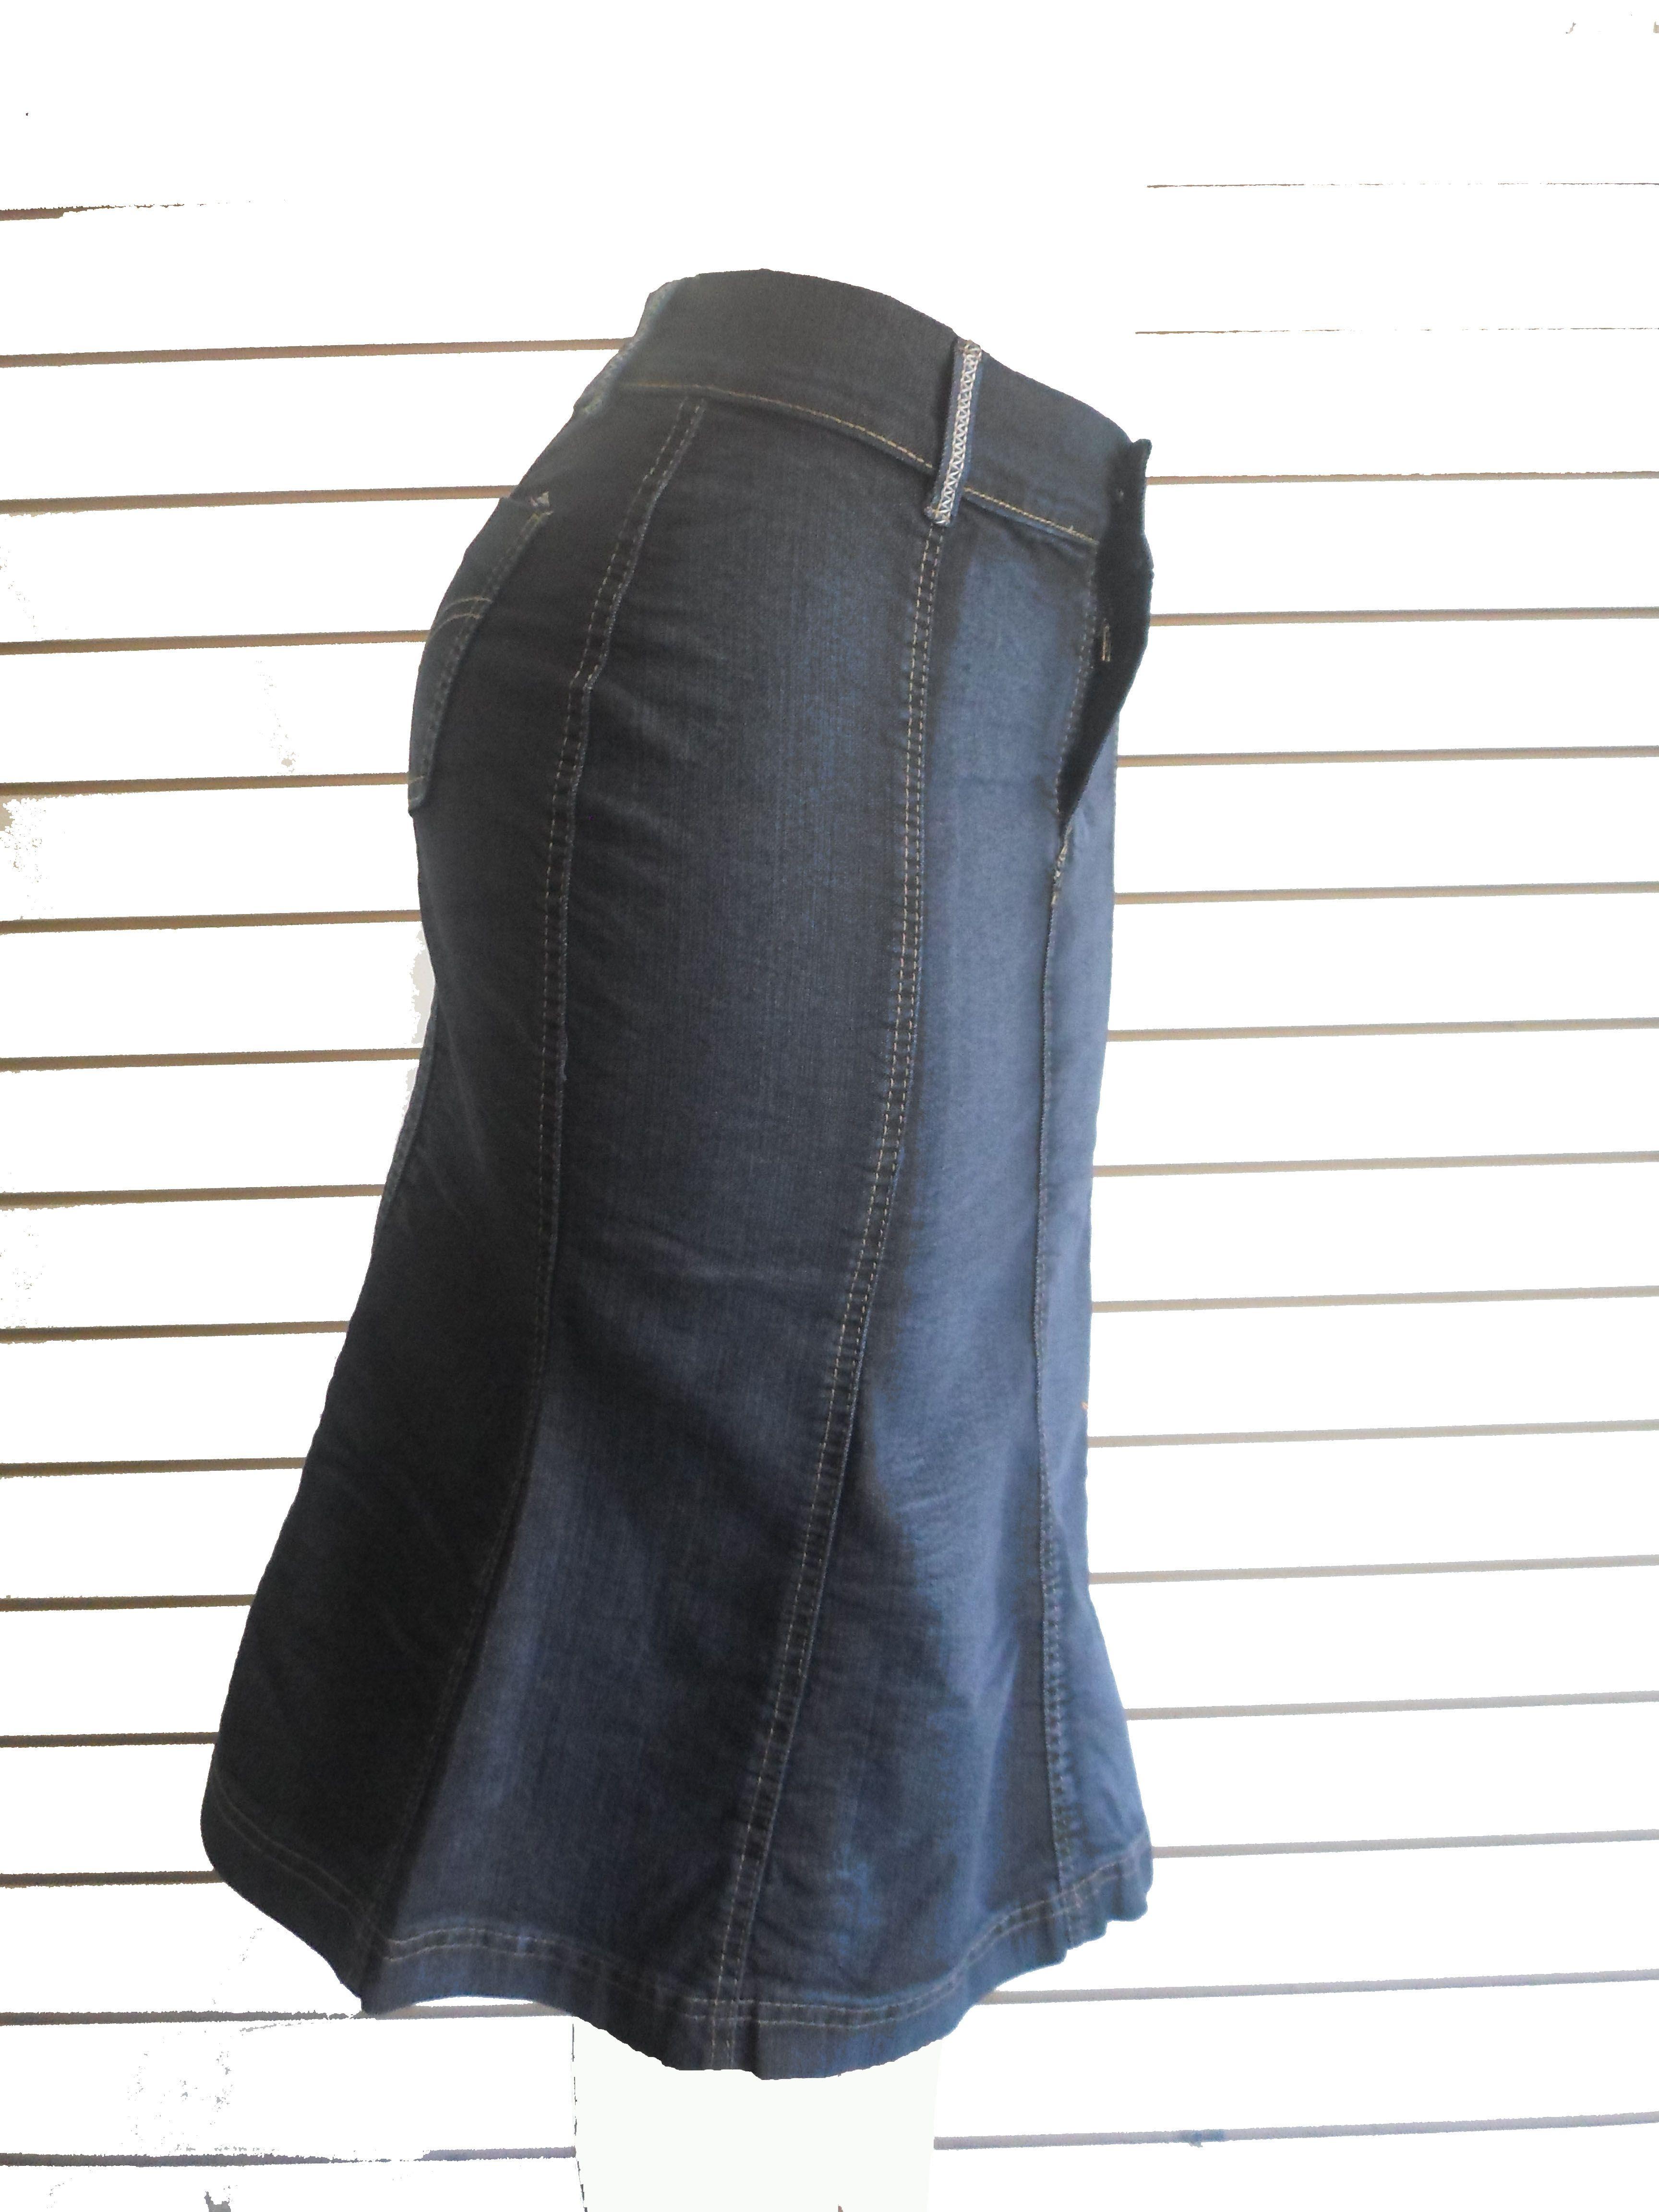 ff910402e5 falda dama en tela jeans stress quedan solo unidades tallas de la 8 a la 14